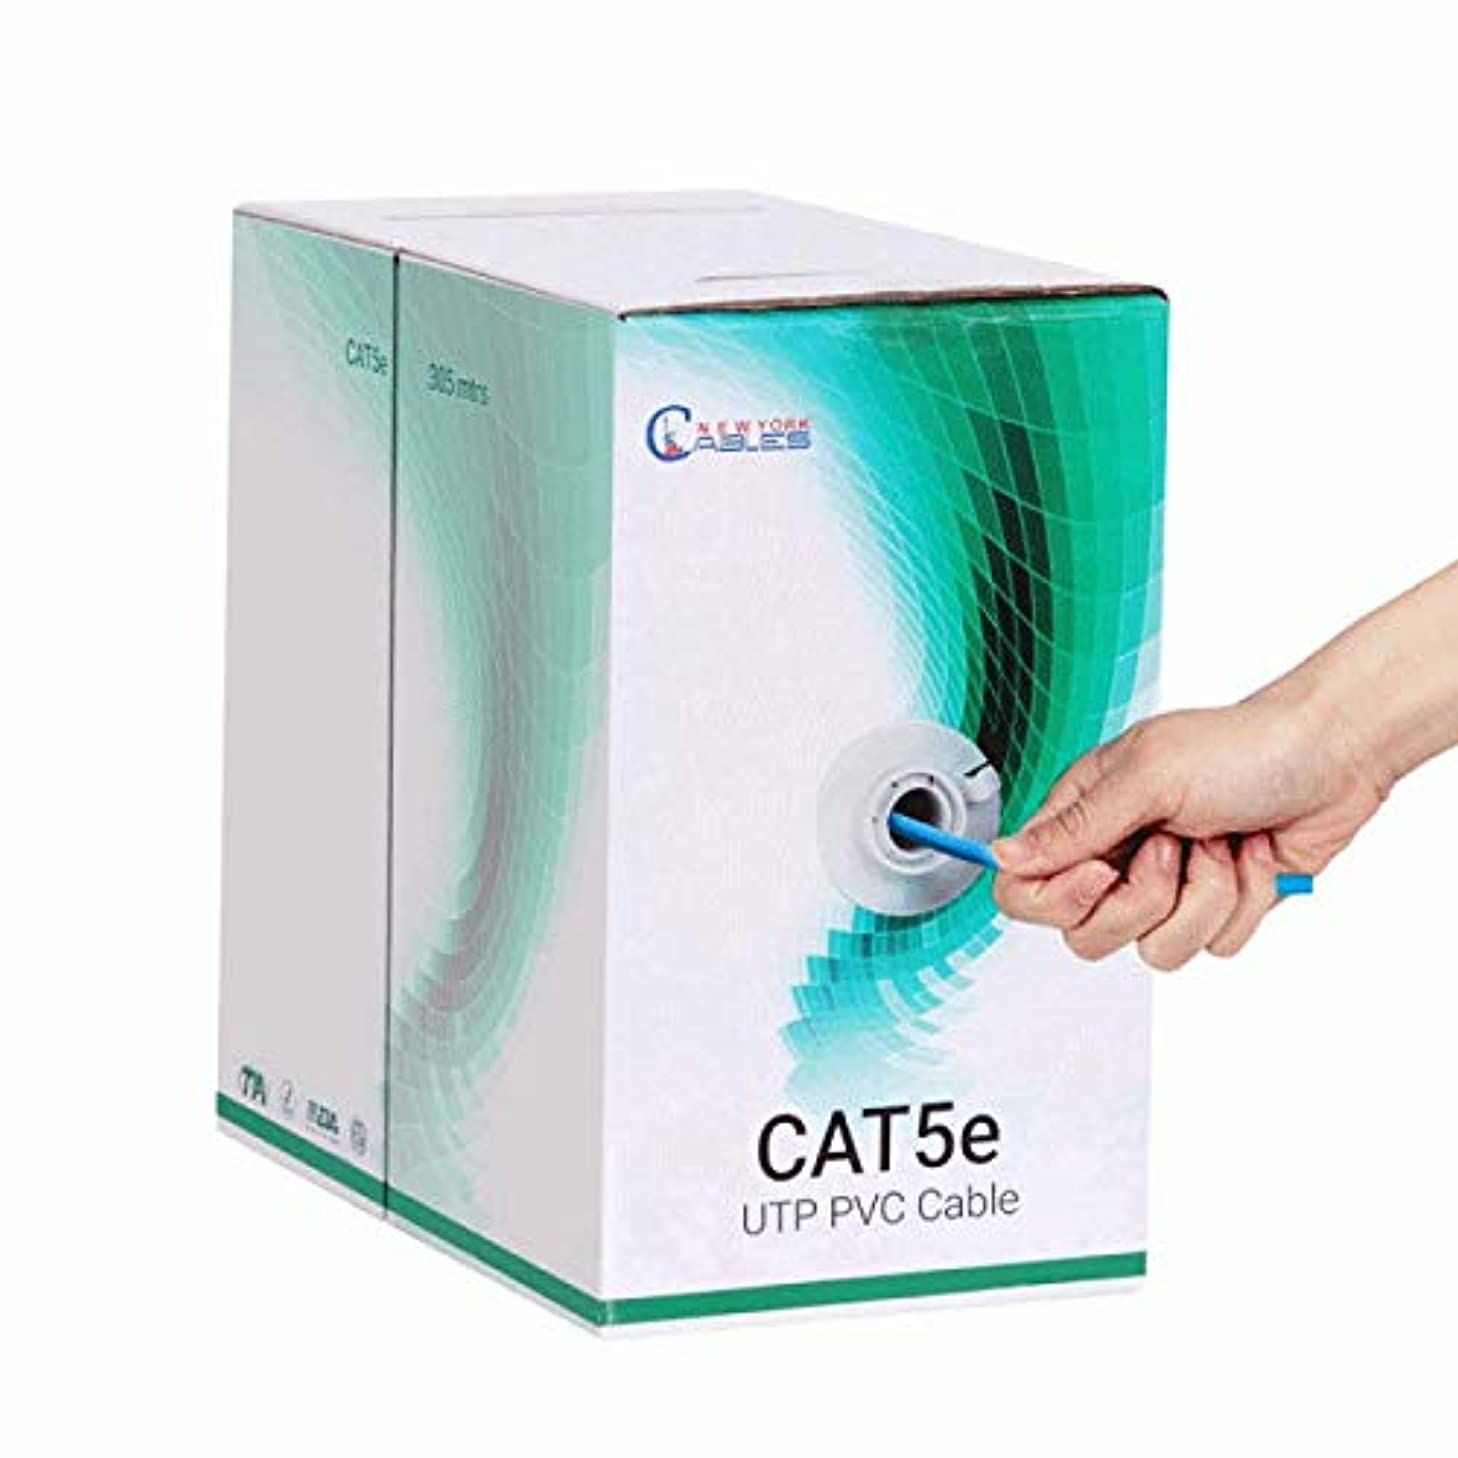 Cat5e Bulk 1000ft Riser Cable, UTP 350mhz Blue Cable - Pull Box